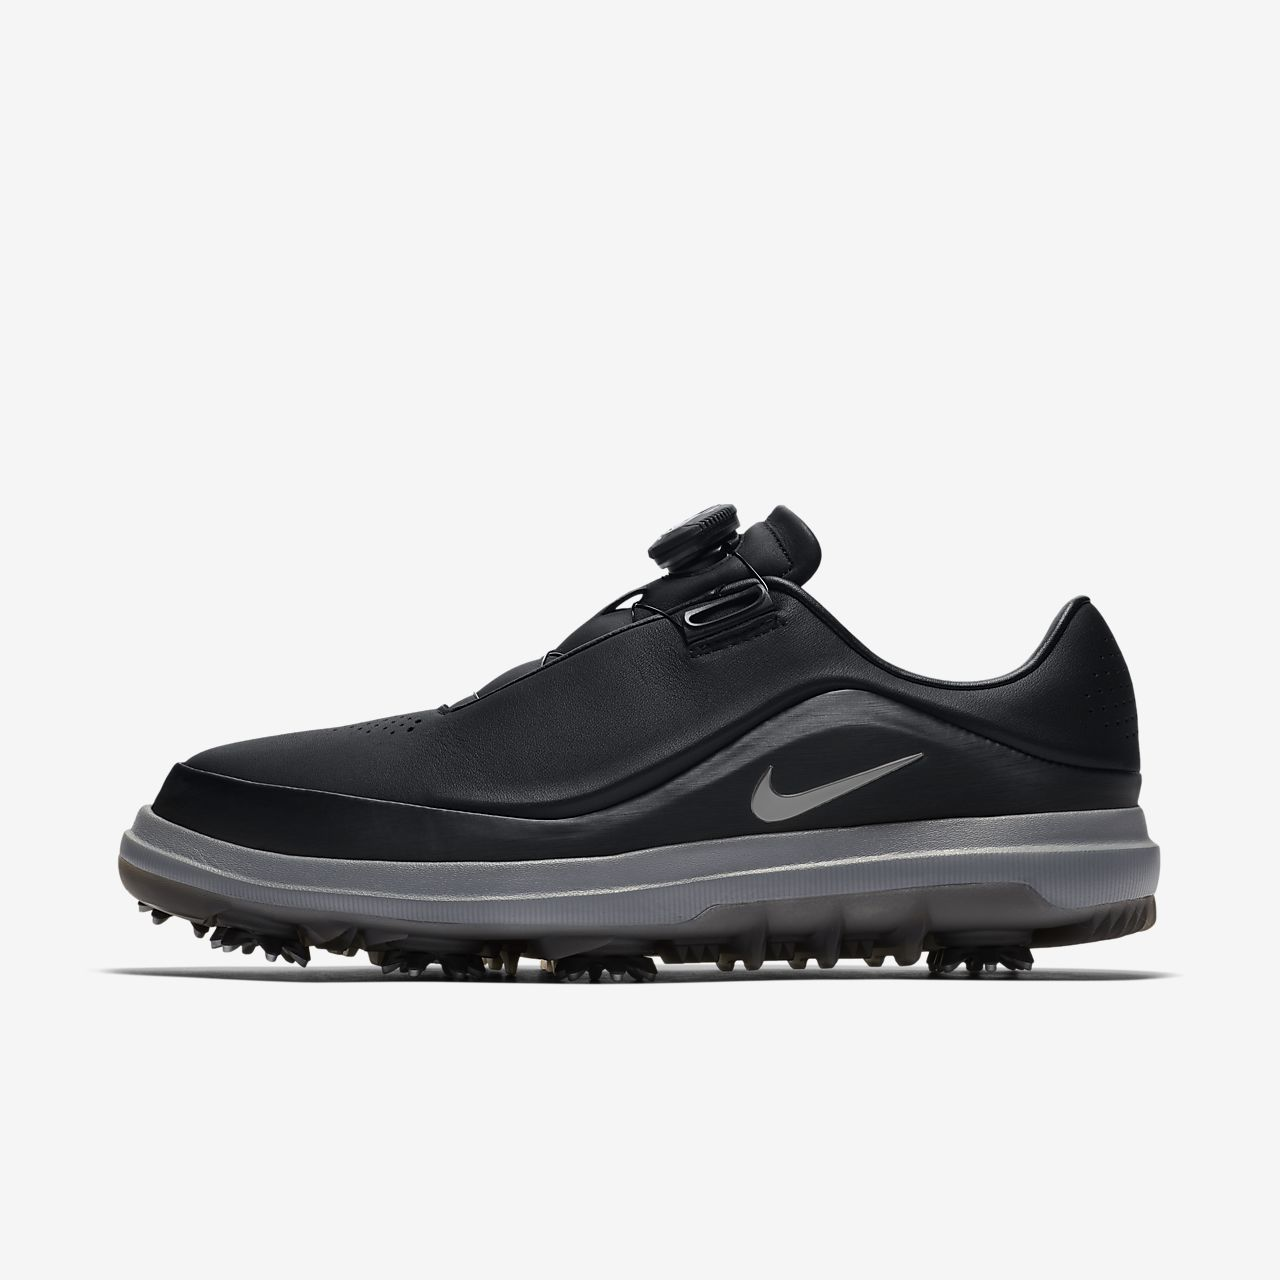 differently 8d601 57883 Męskie buty do golfa Nike Air Zoom Precision BOA ®